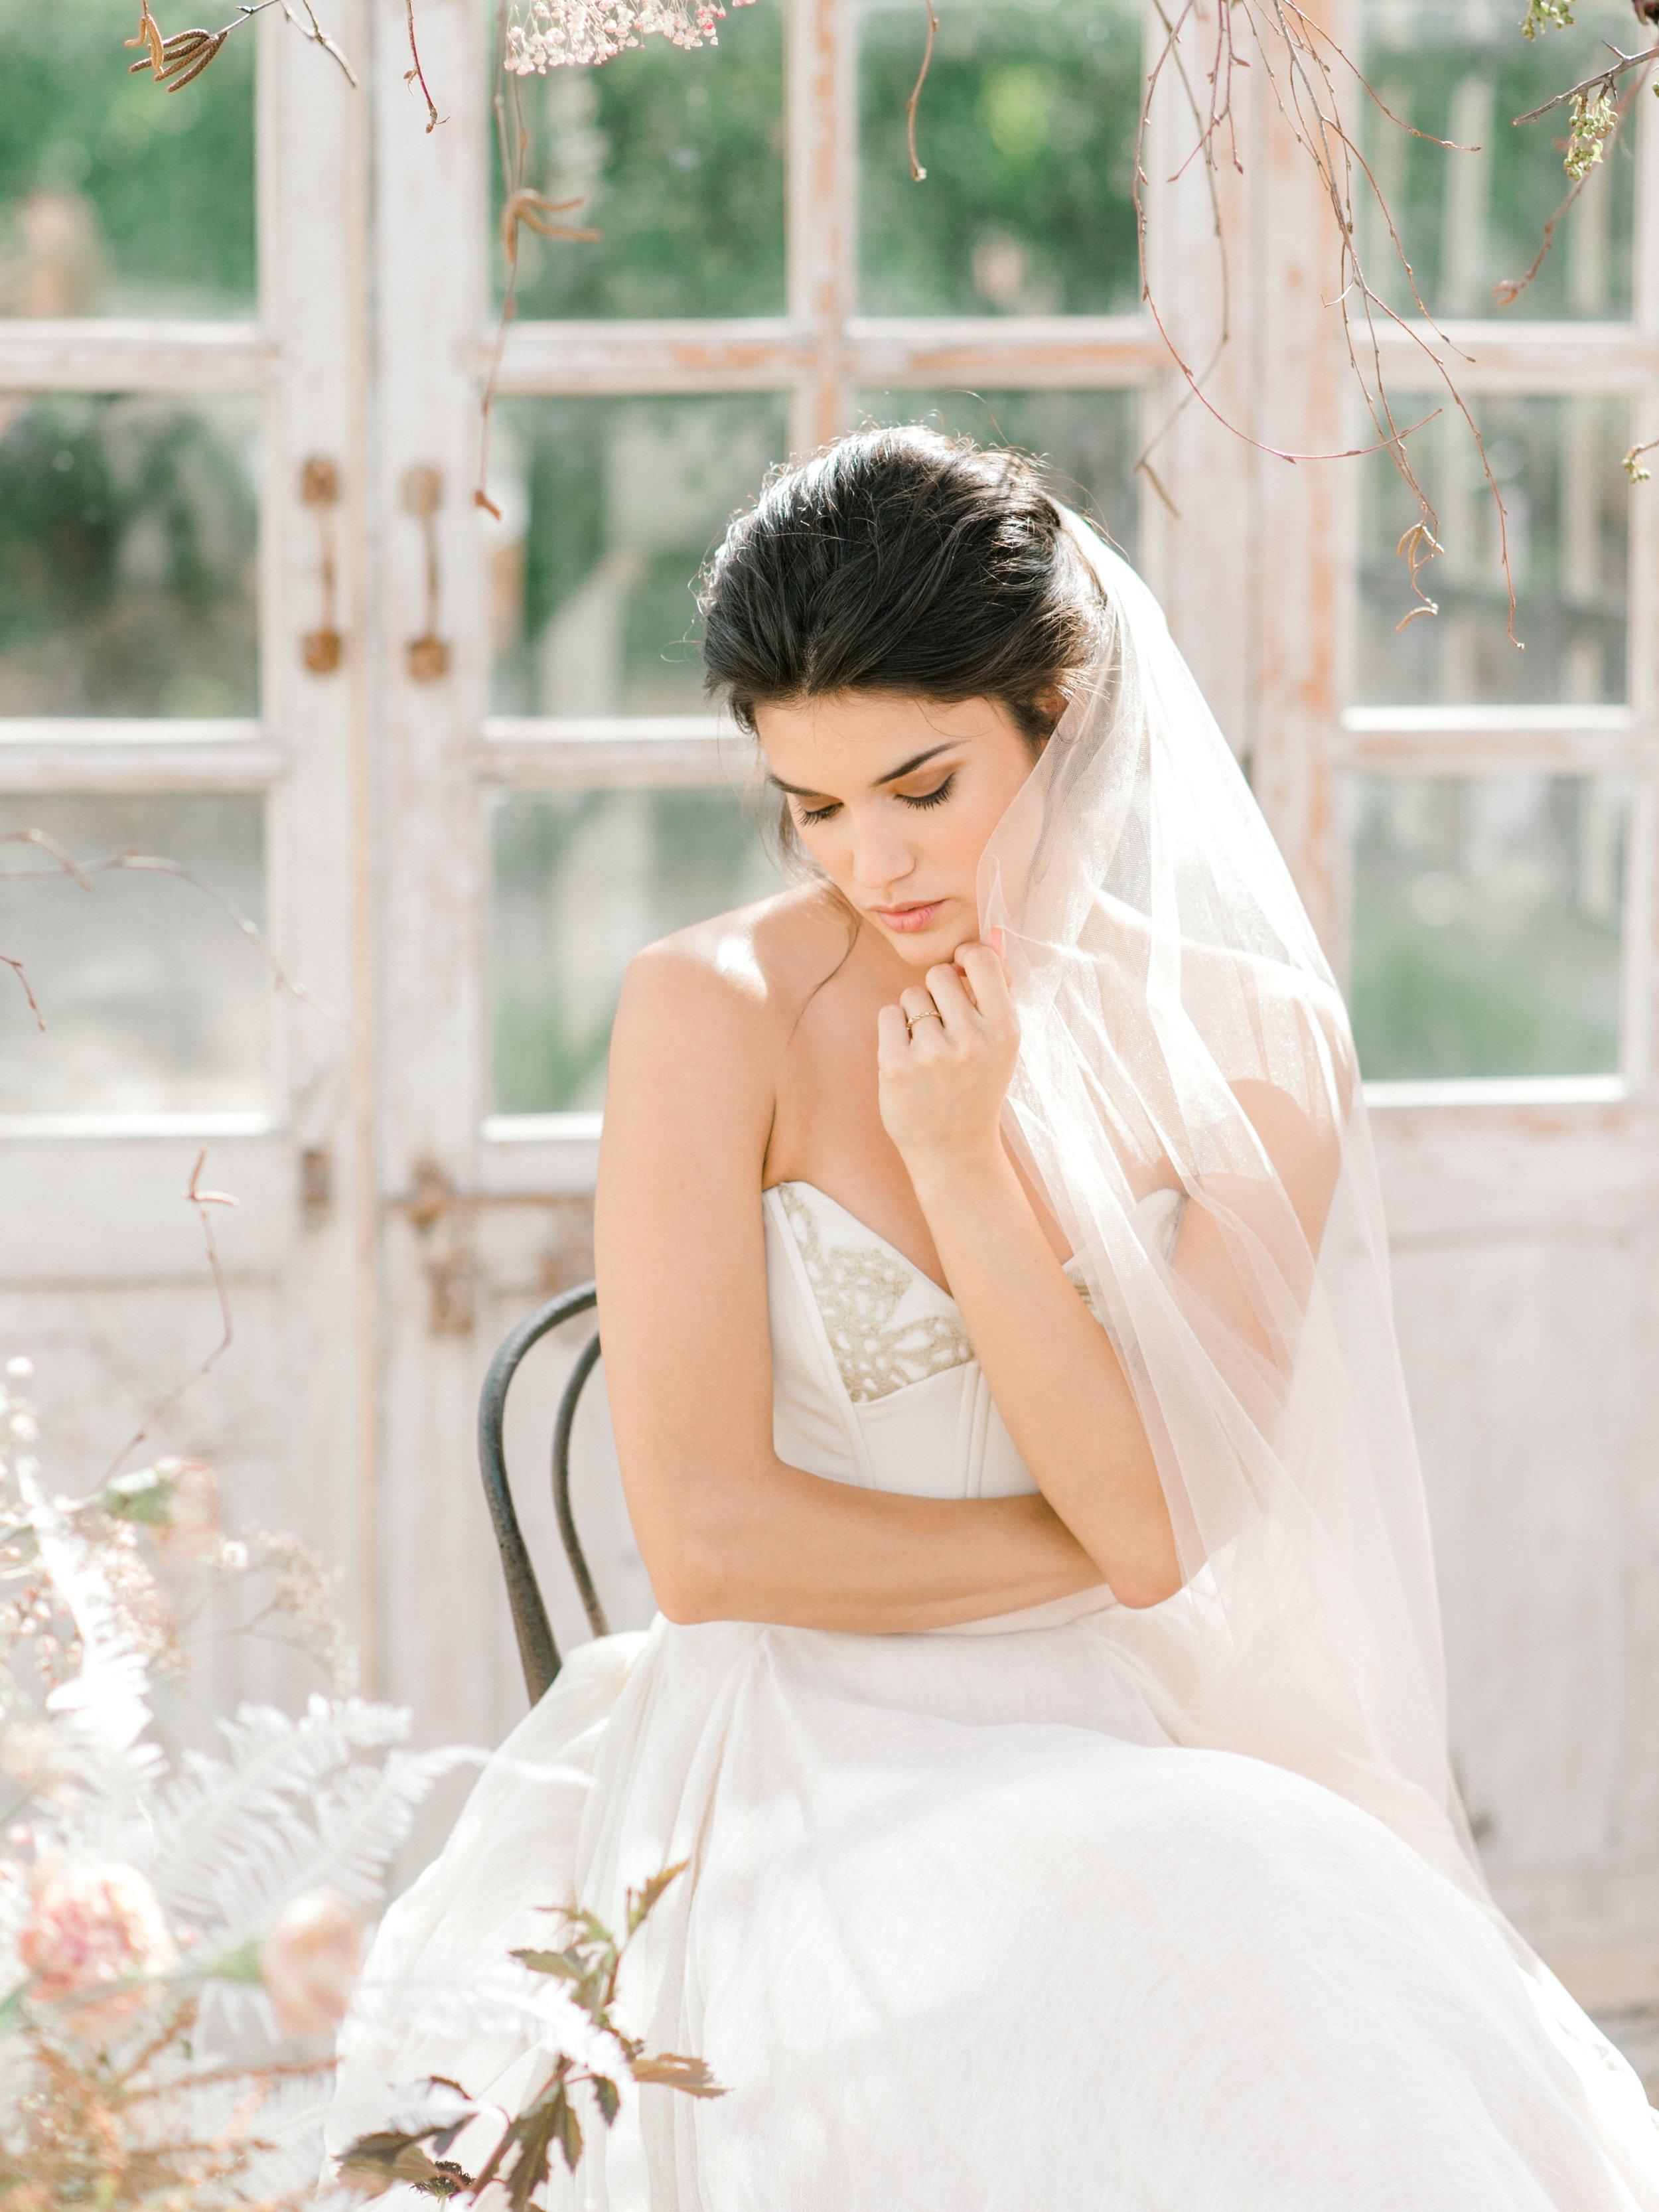 Carol Hannah fritillary wedding dress kensington skirt-12-113.jpg